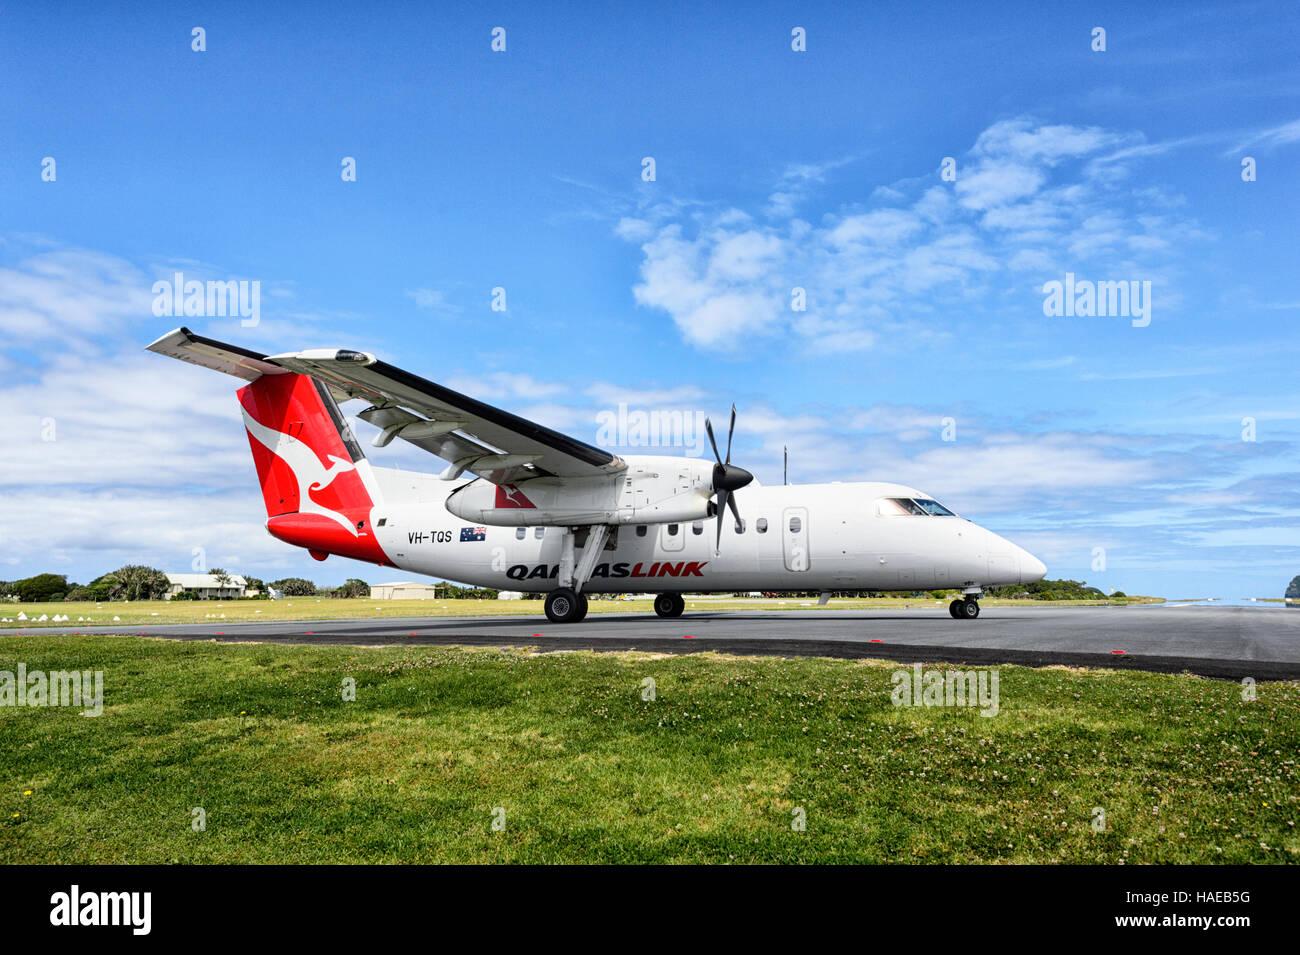 QantasLink de Havilland DHC-8 200 Series DASH 8 Aircraft taxiing on Lord Howe Island runway, New South Wales, Australia - Stock Image